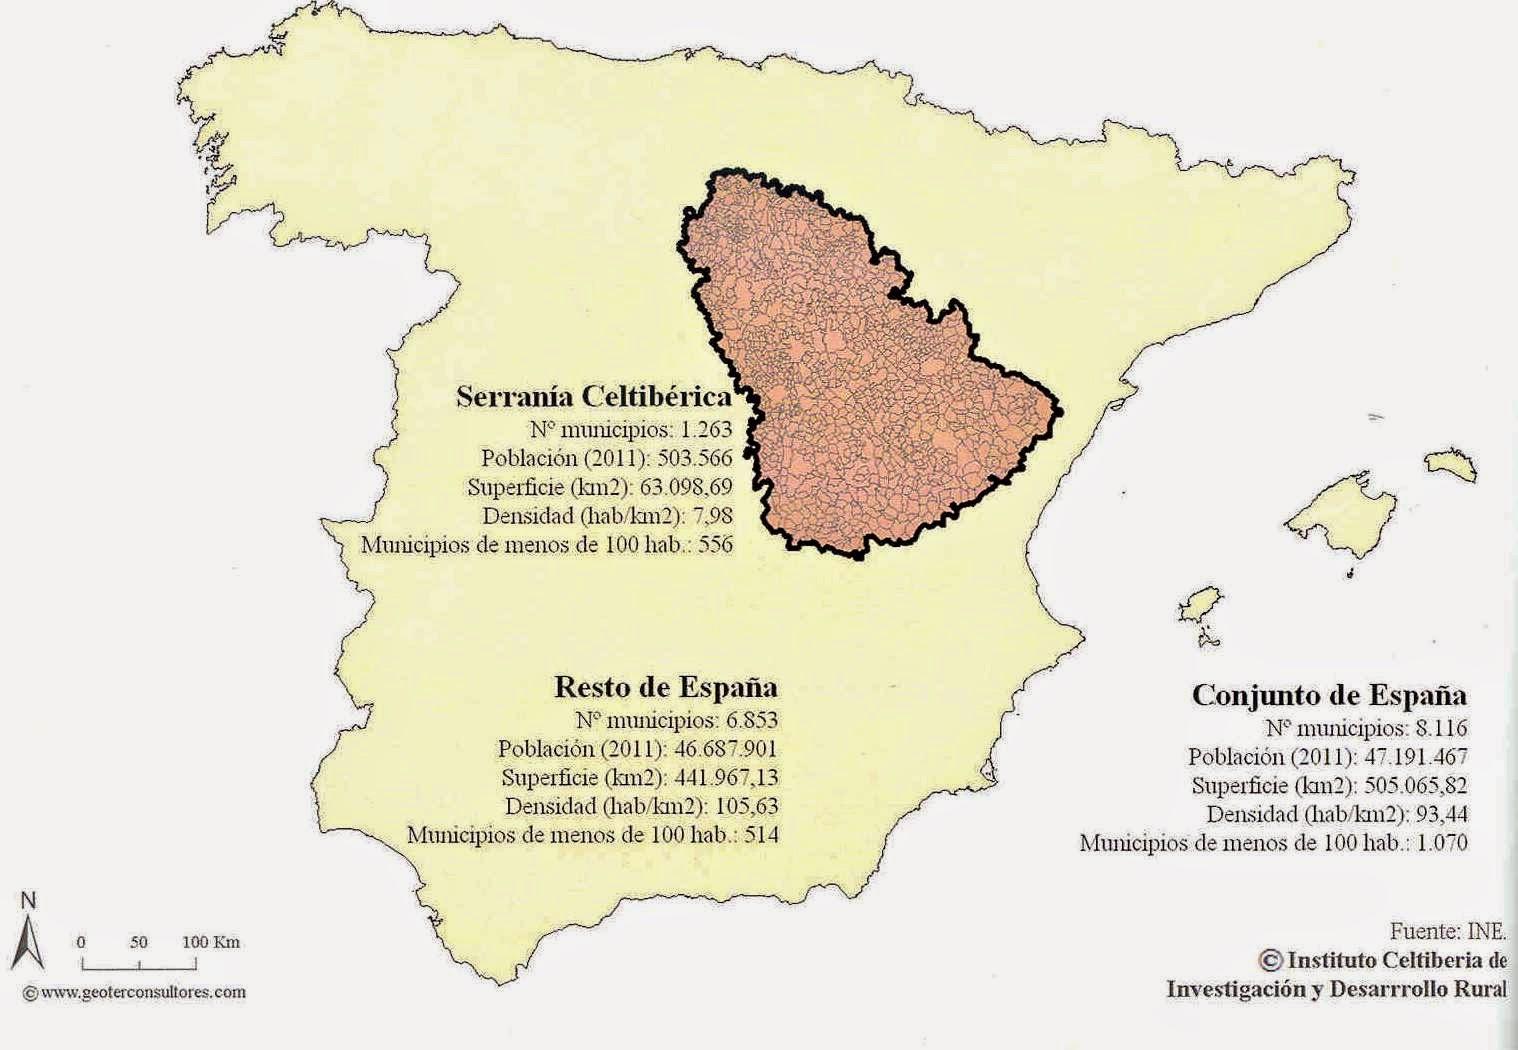 serrania-celtiberica-poblacion